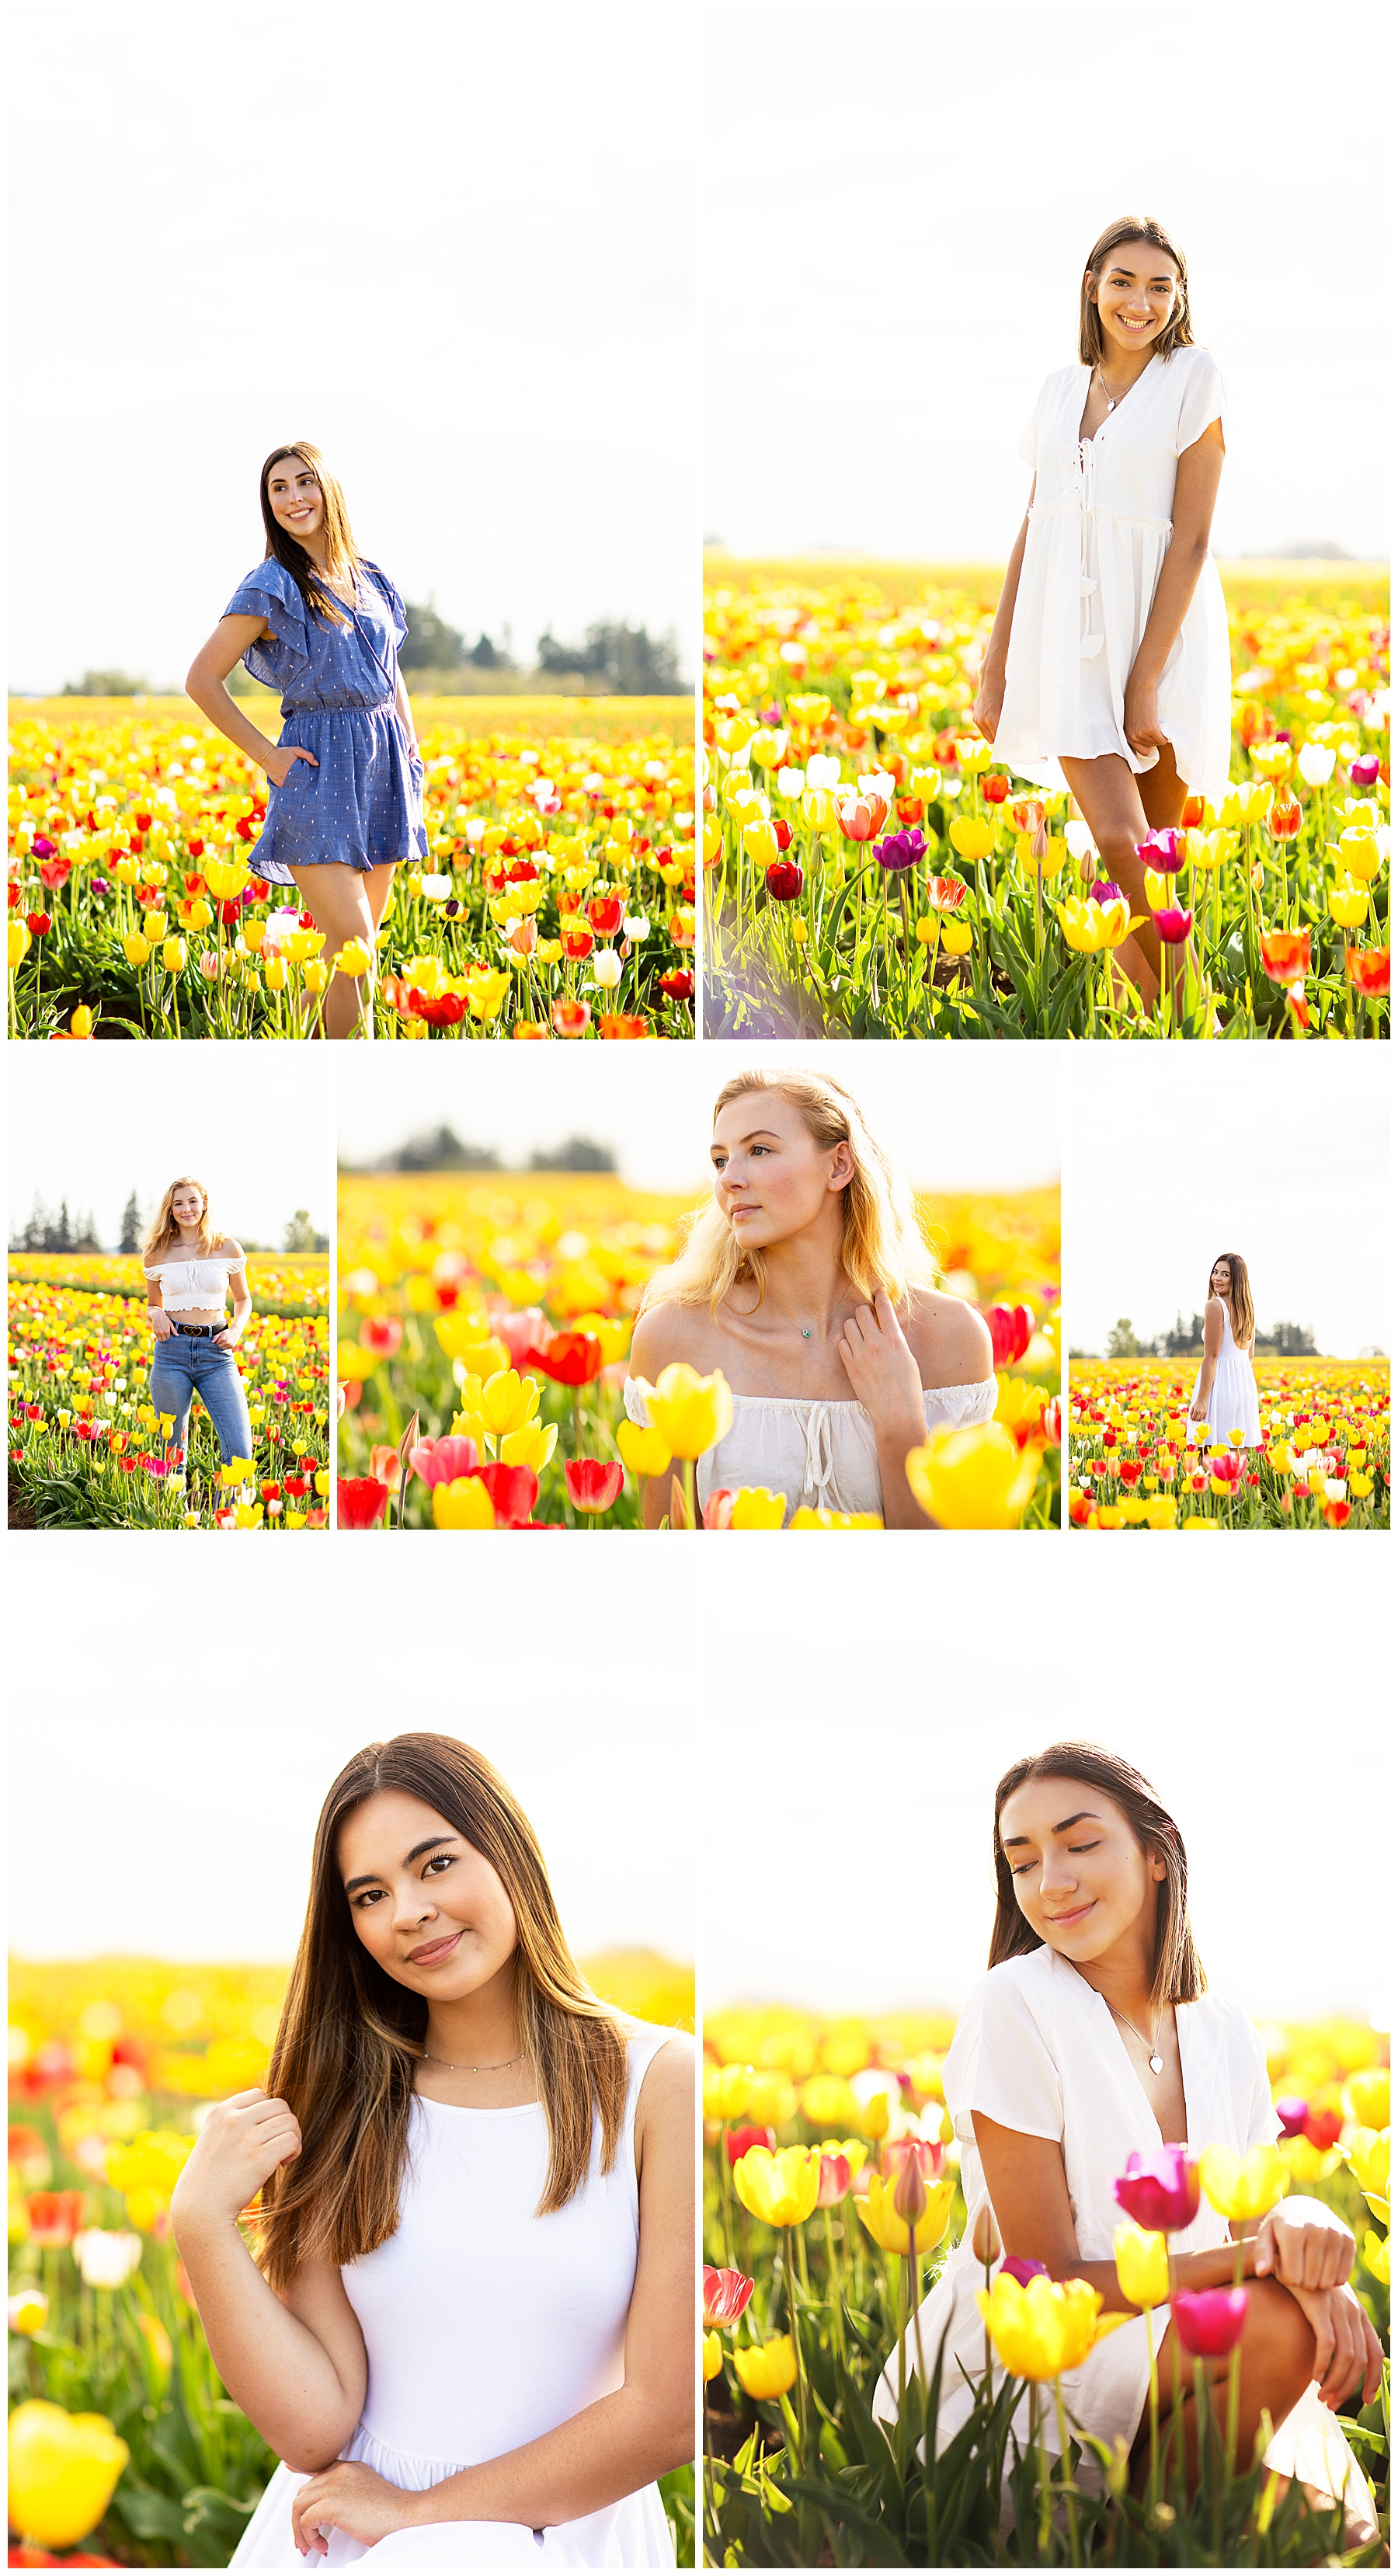 senior photos at the tulip festival 2019 OR 2.jpg